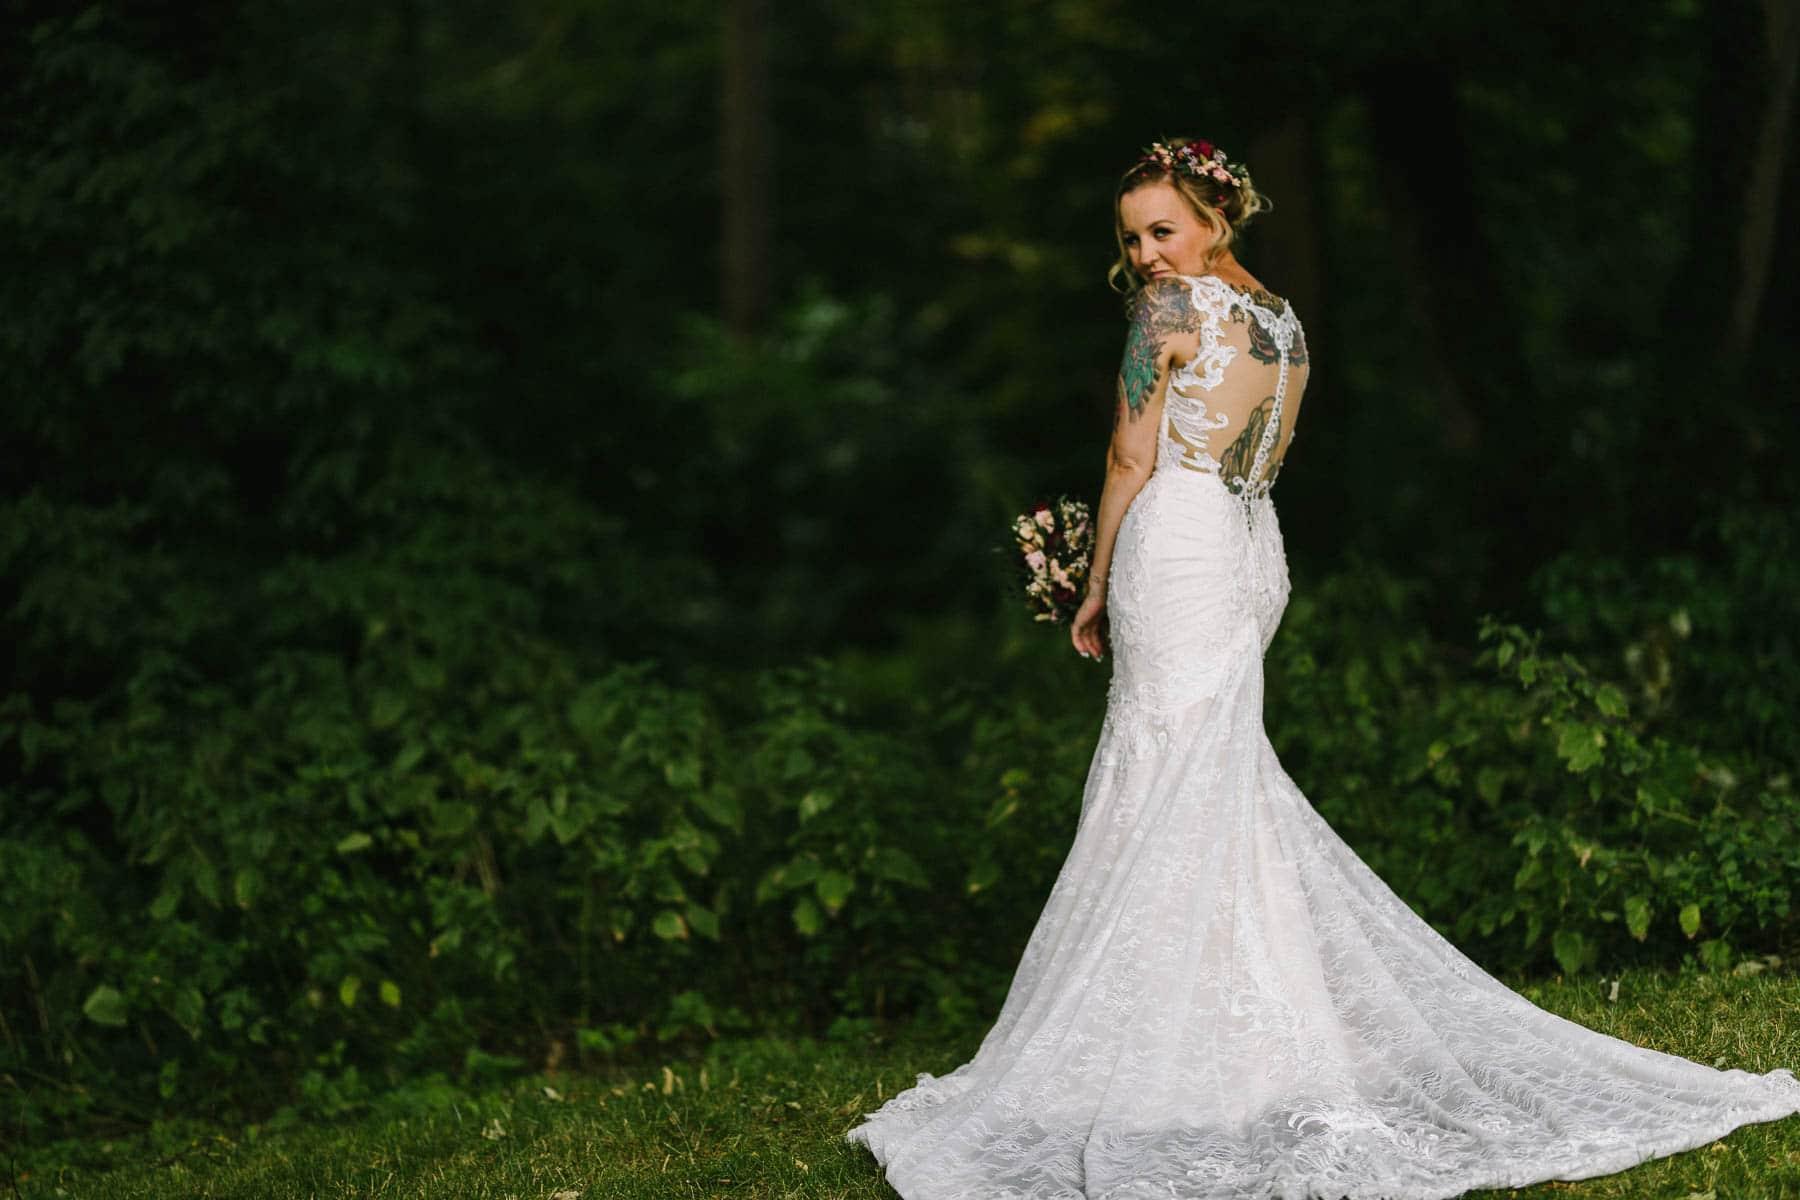 bride turning back towards the camera looking at the camera